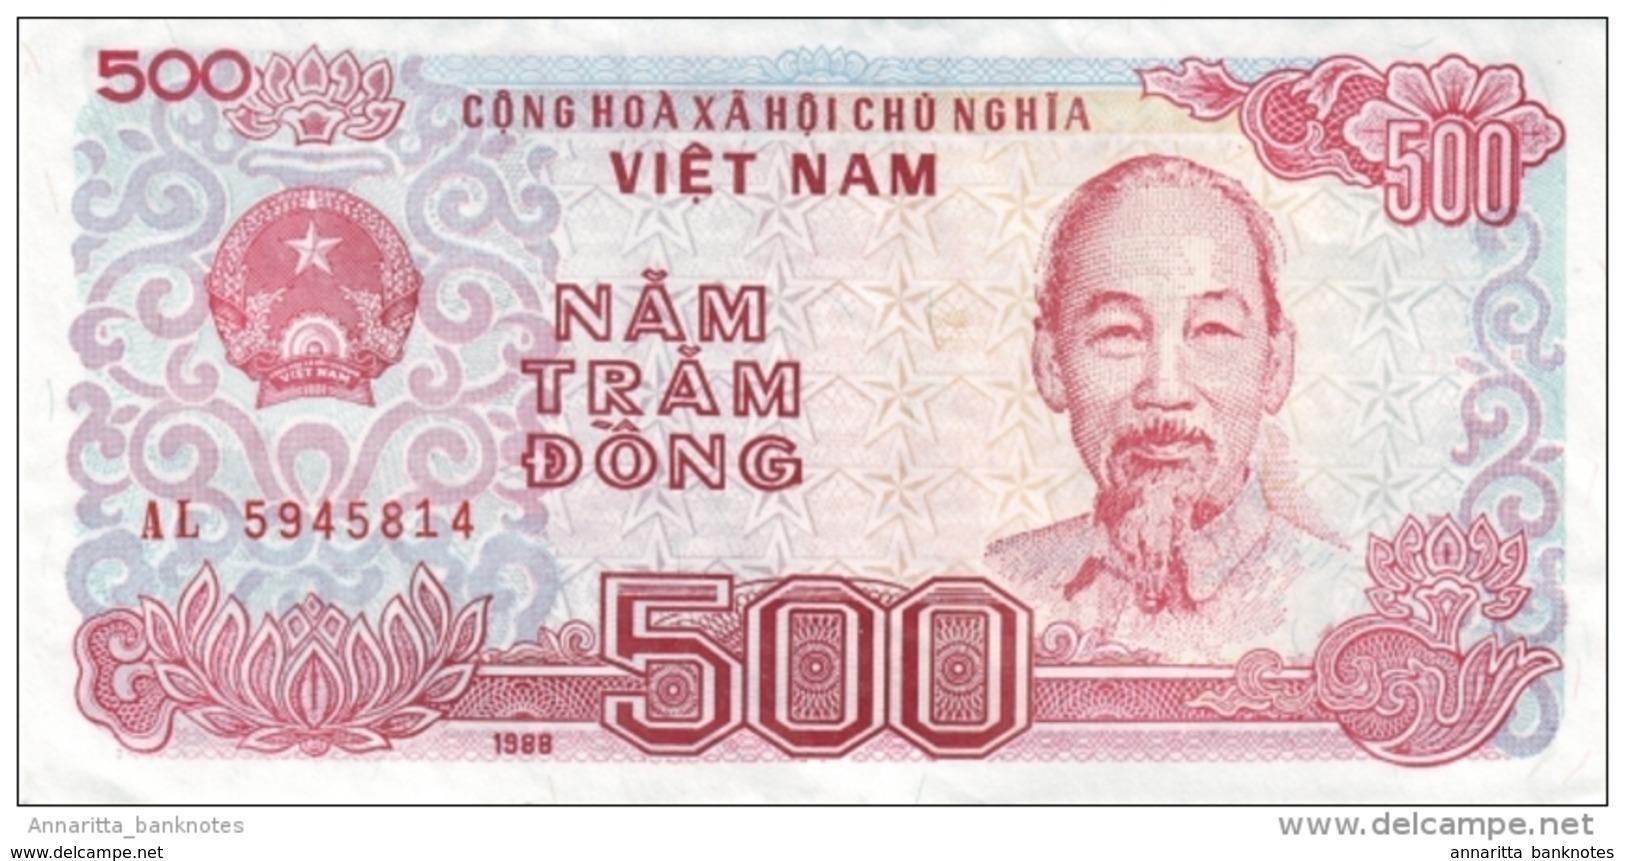 VIETNAM 500 ĐỒNG 1988 (1989) P-101a NEUF PETIT S/N [VN329a] - Vietnam